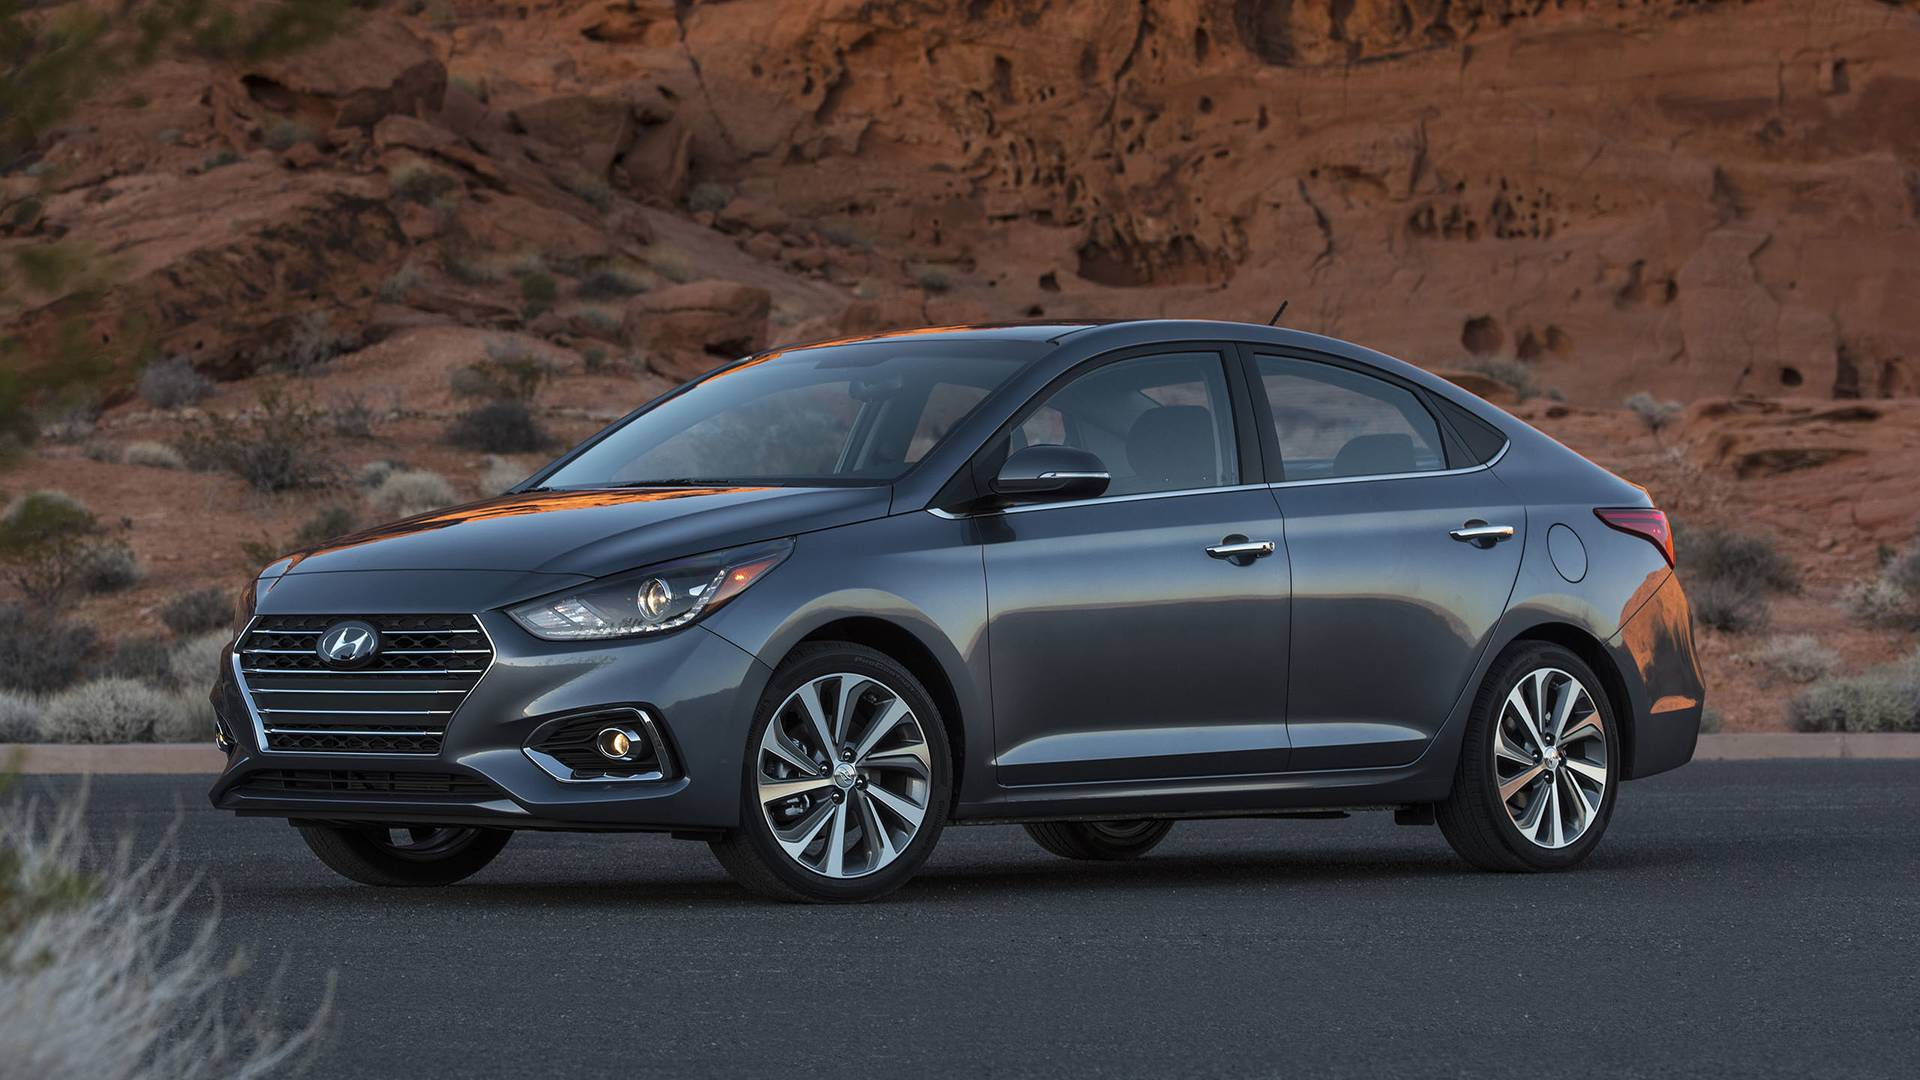 2018 Hyundai Accent First Drive Cheap Refinement